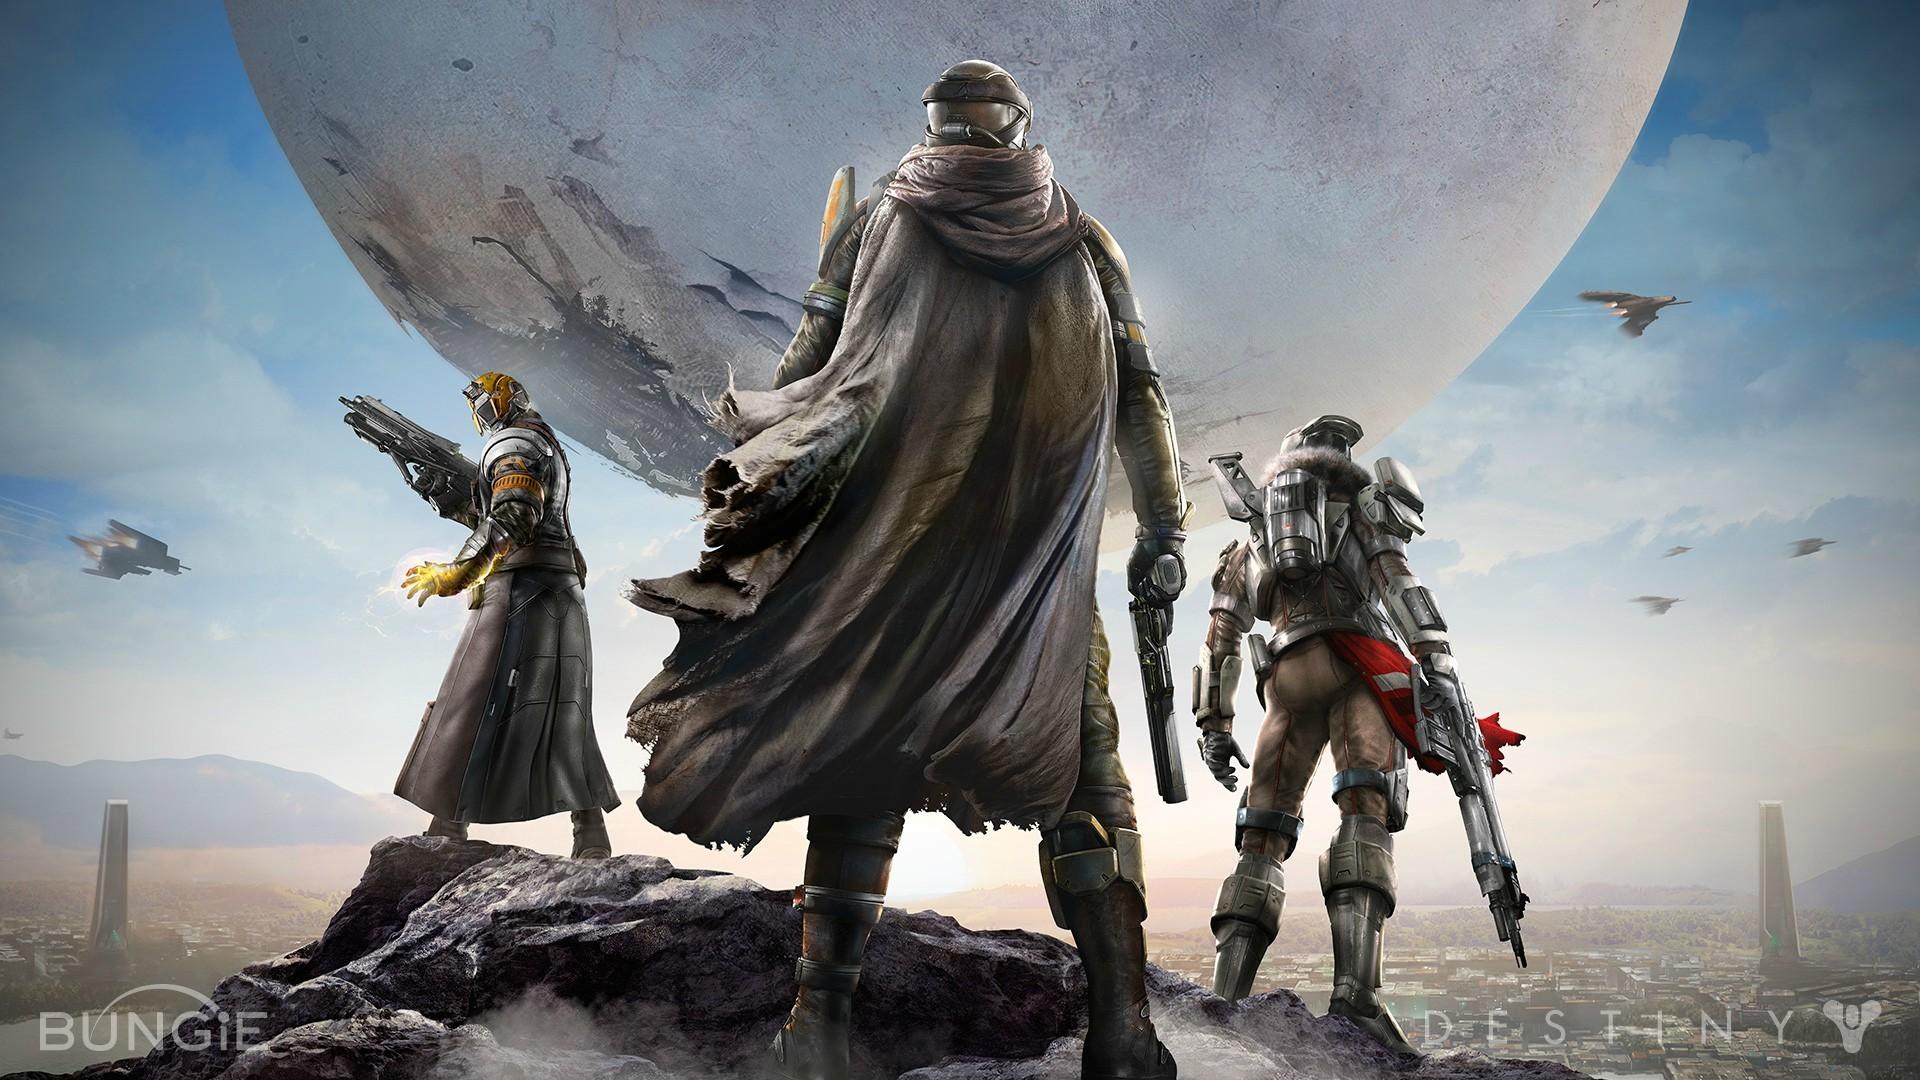 Destiny Wallpaper 1080p 85 Images